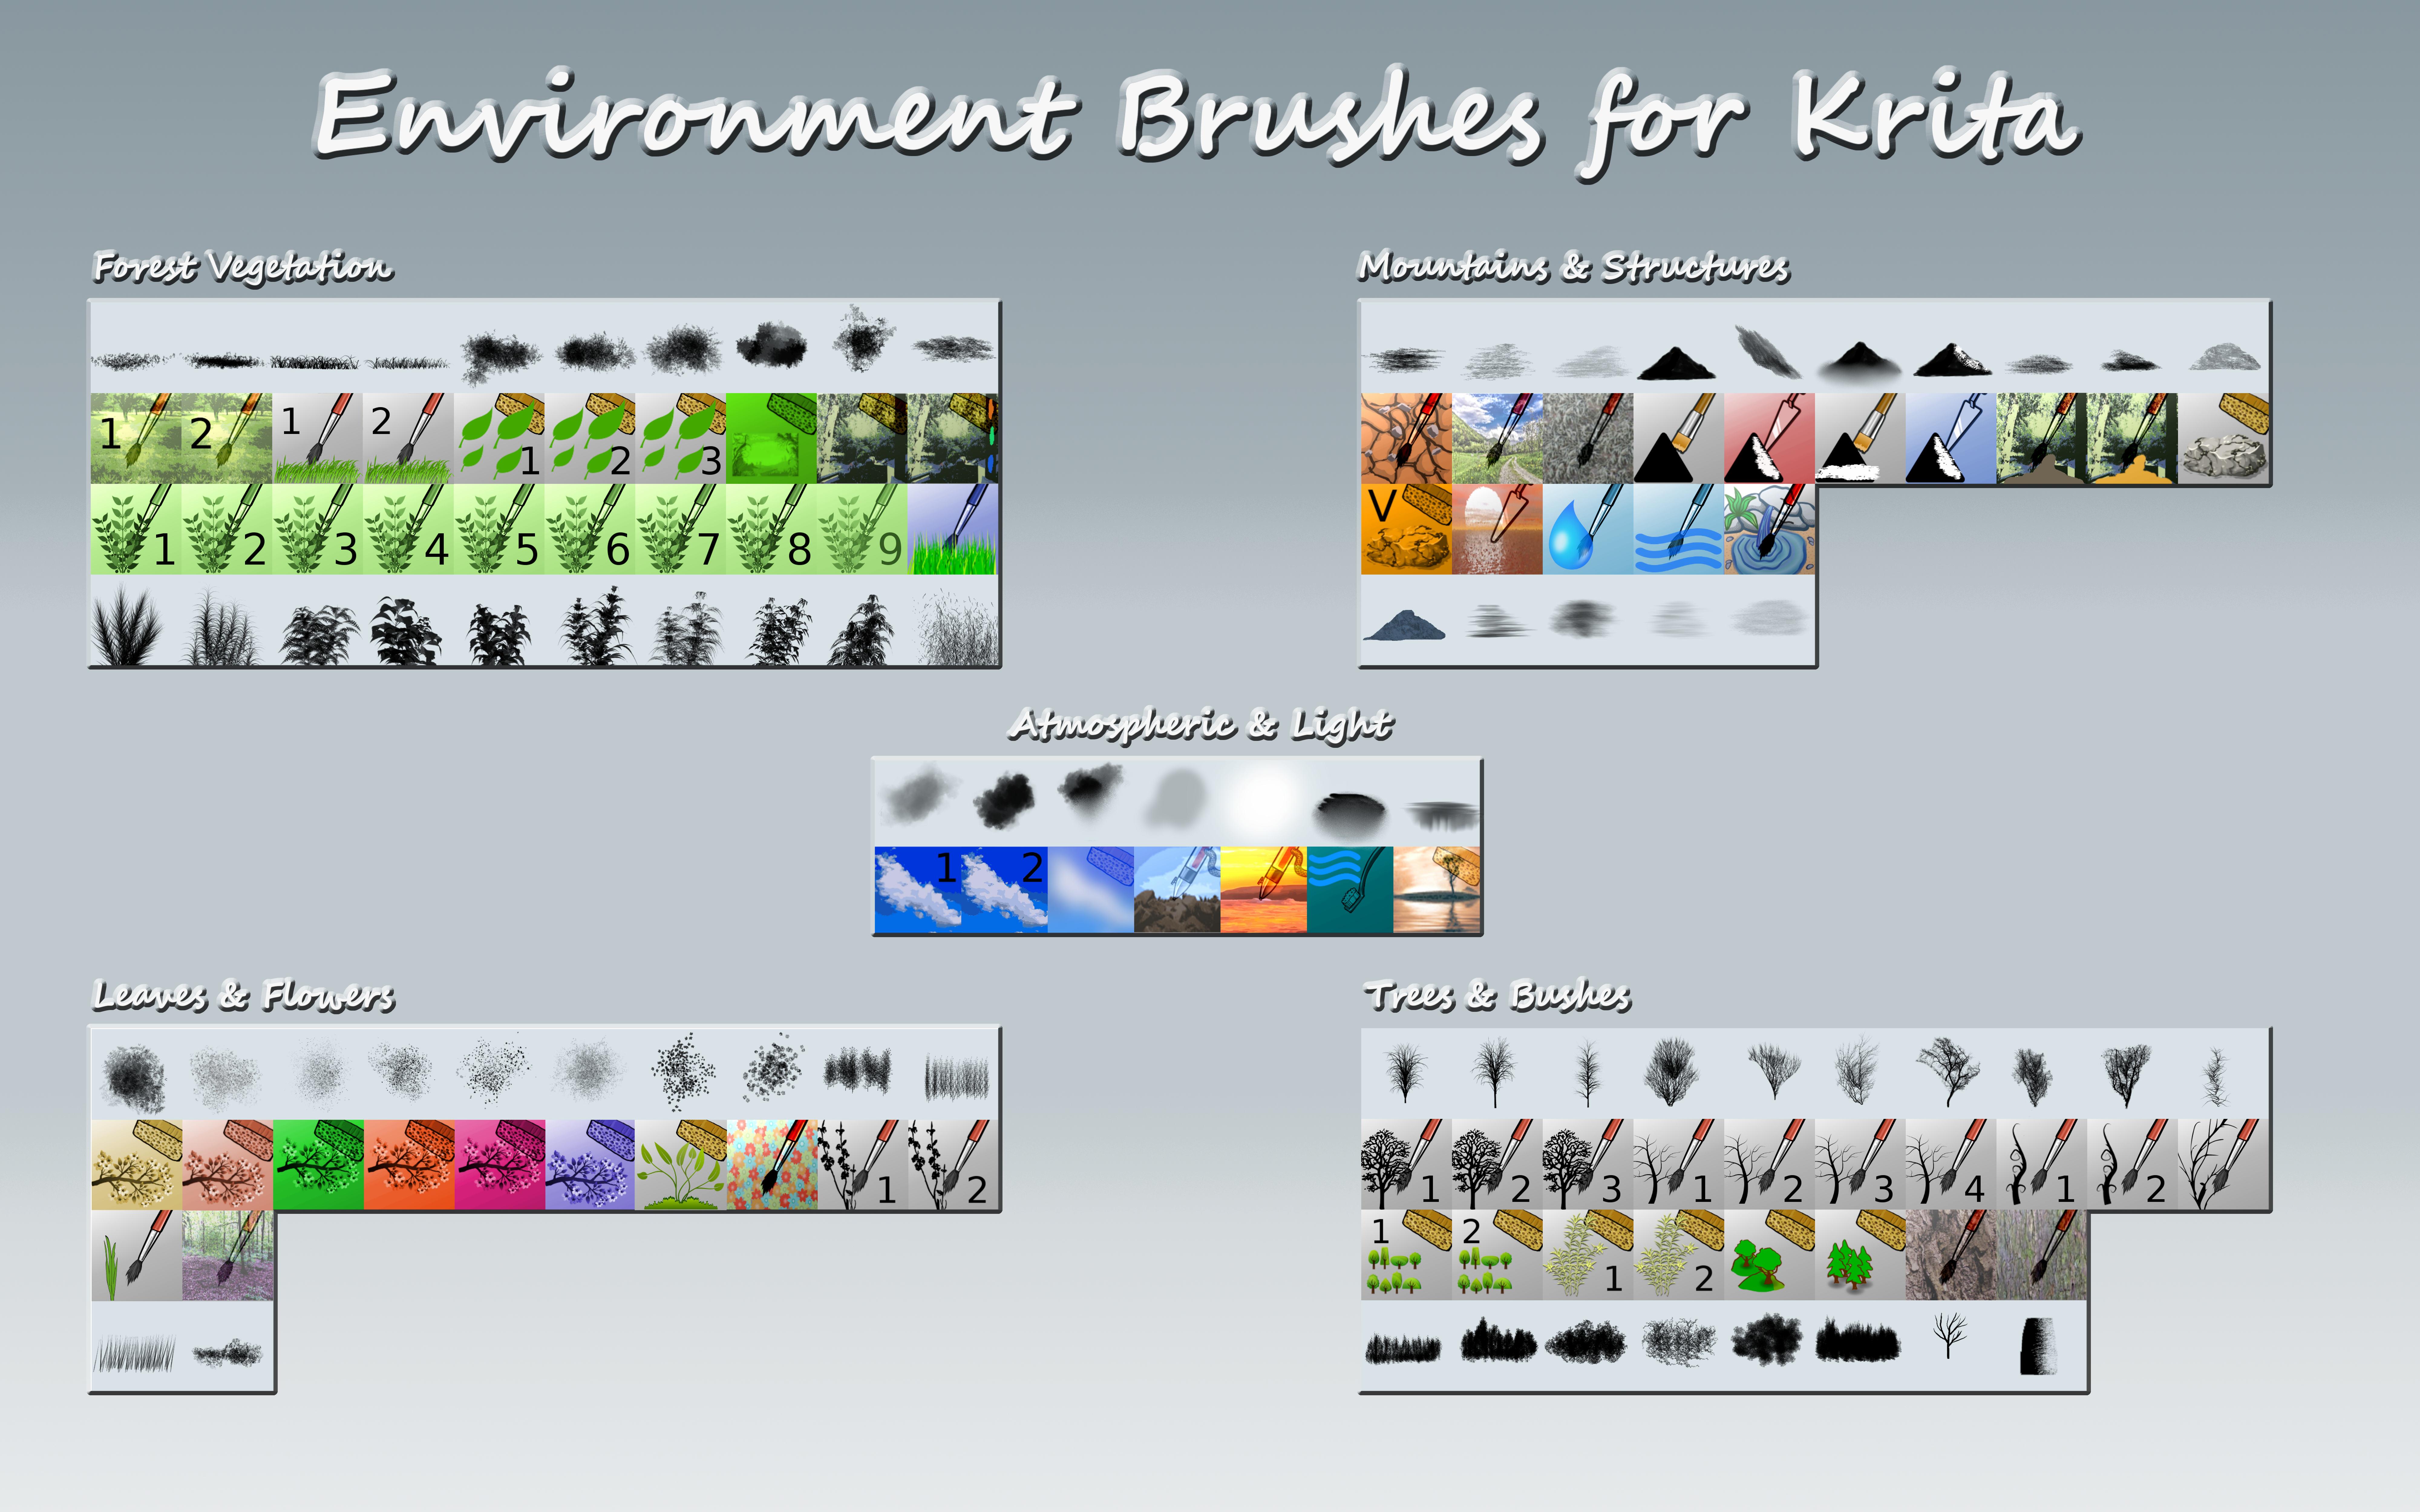 Krita Environment Brushes by IForce73 on DeviantArt